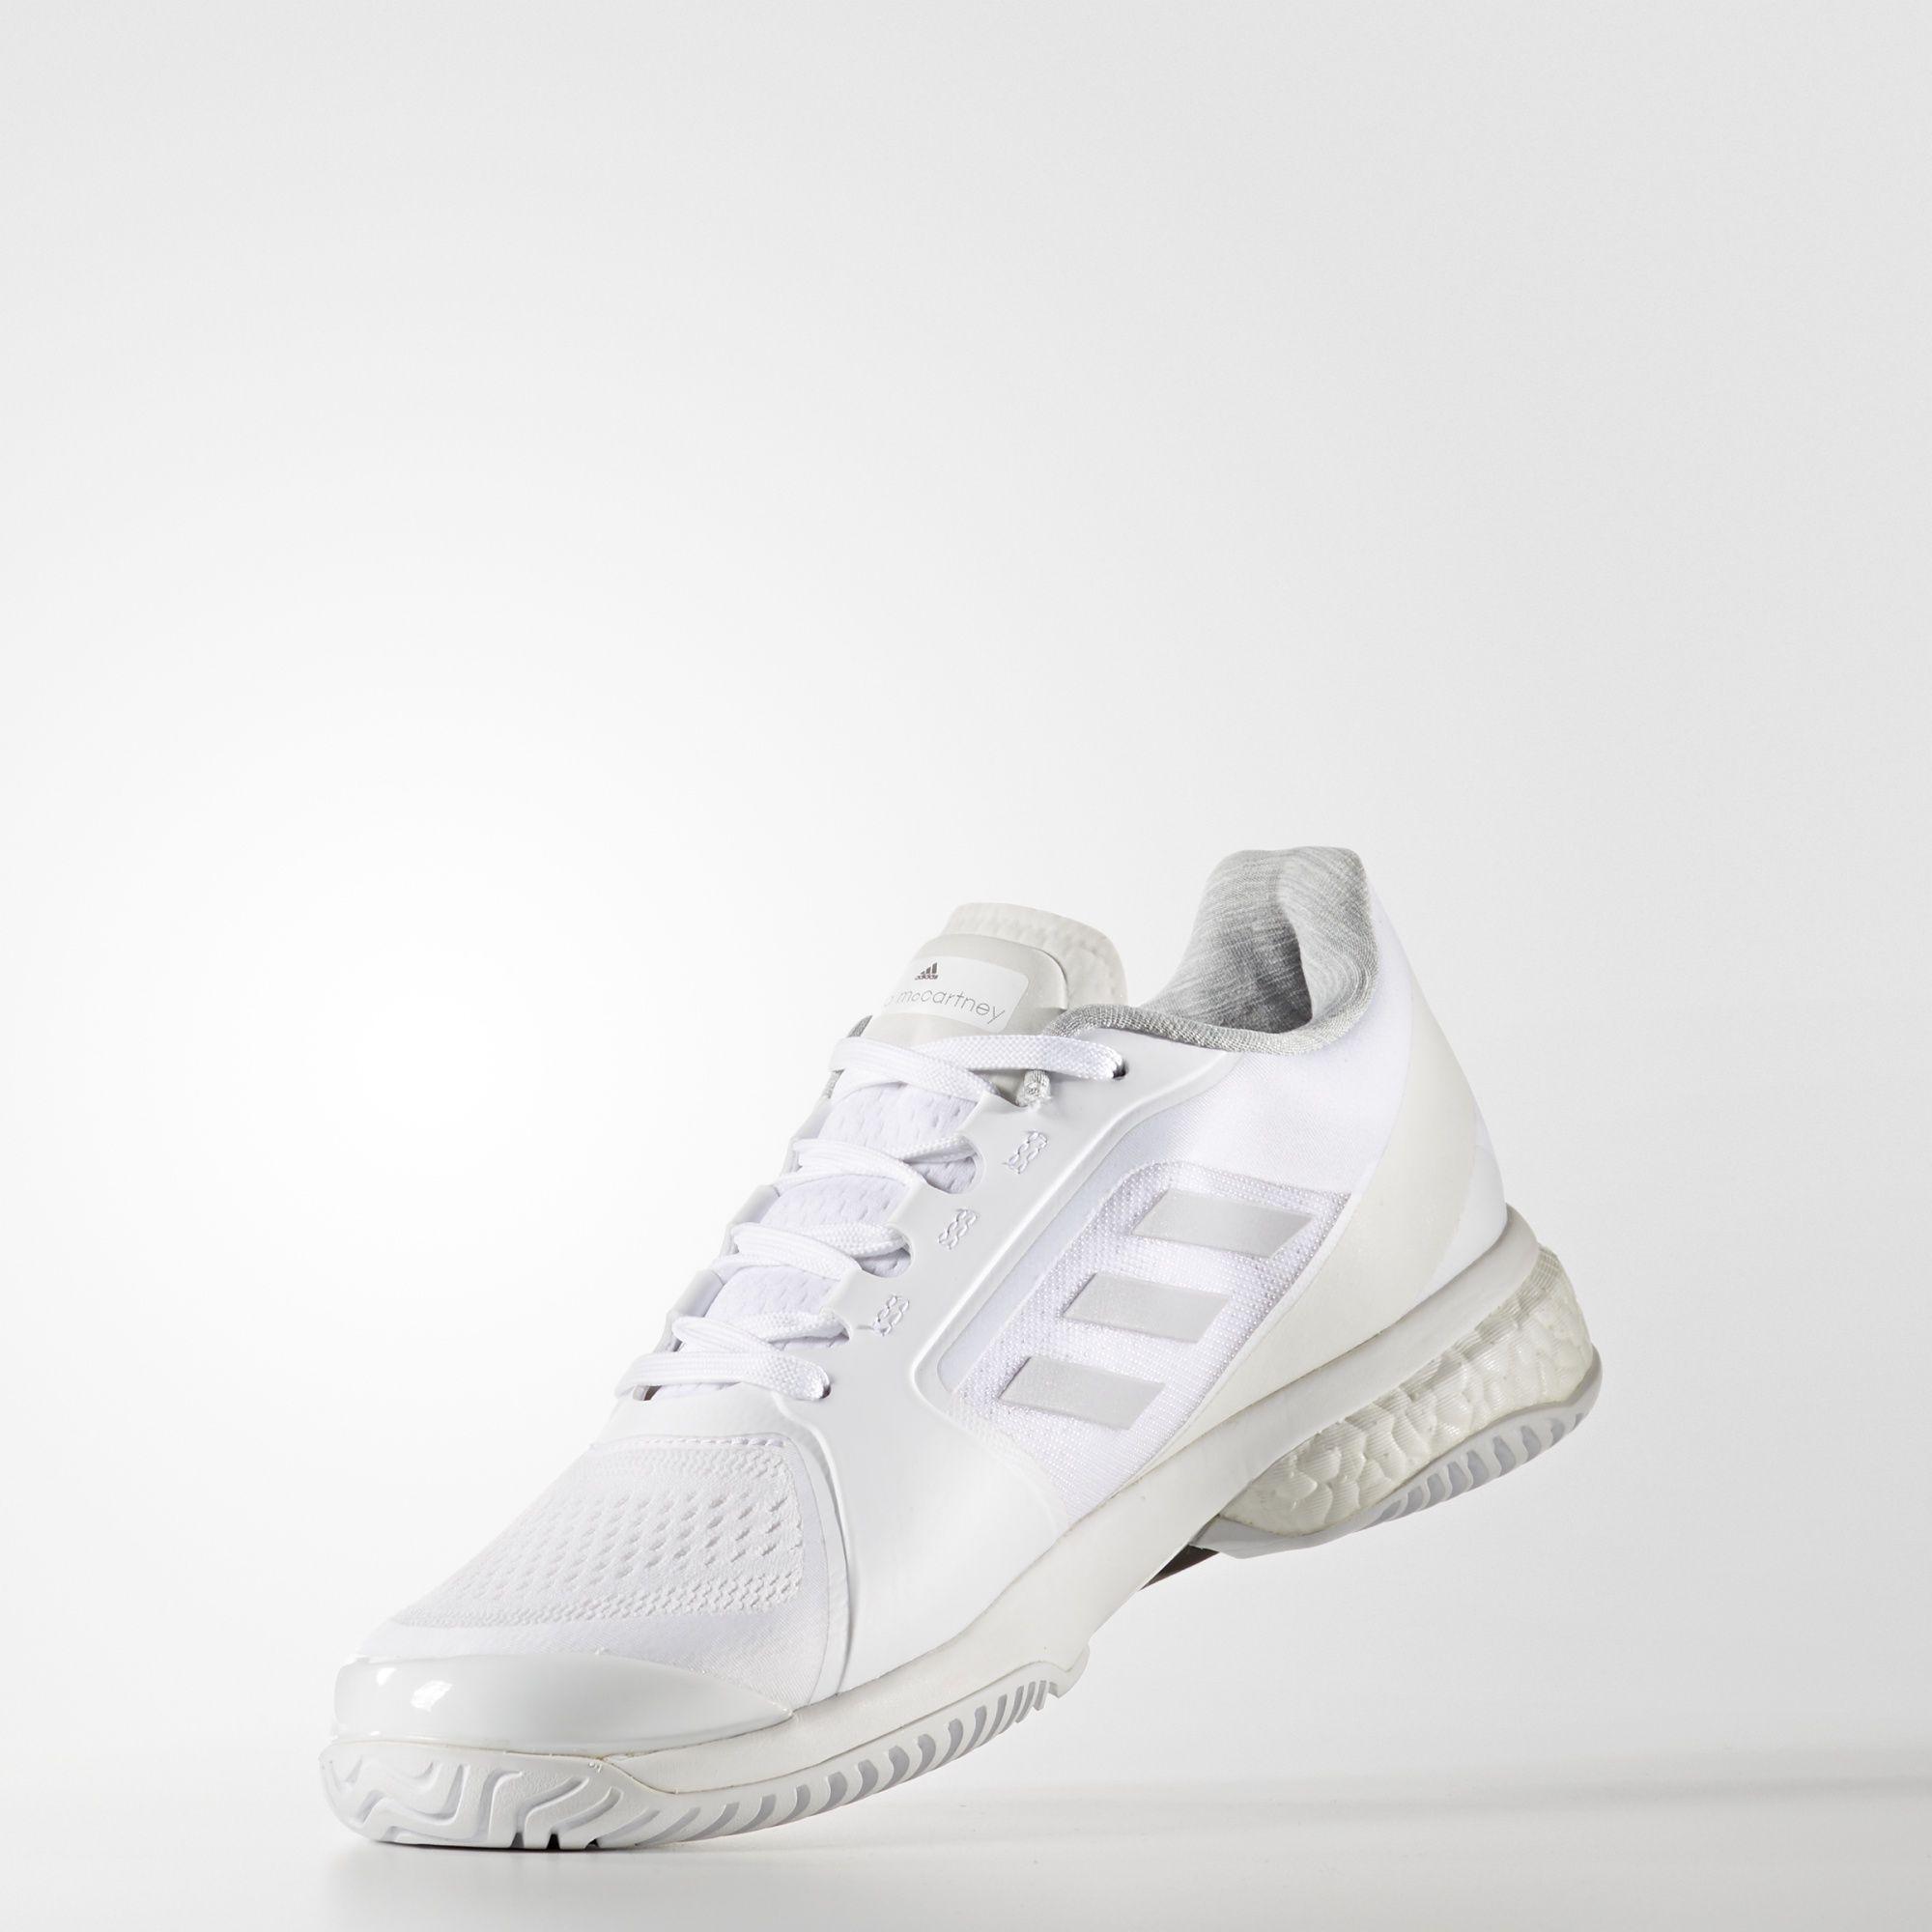 Adidas donne smc barricata impulso 2017, scarpe da tennis bianchi